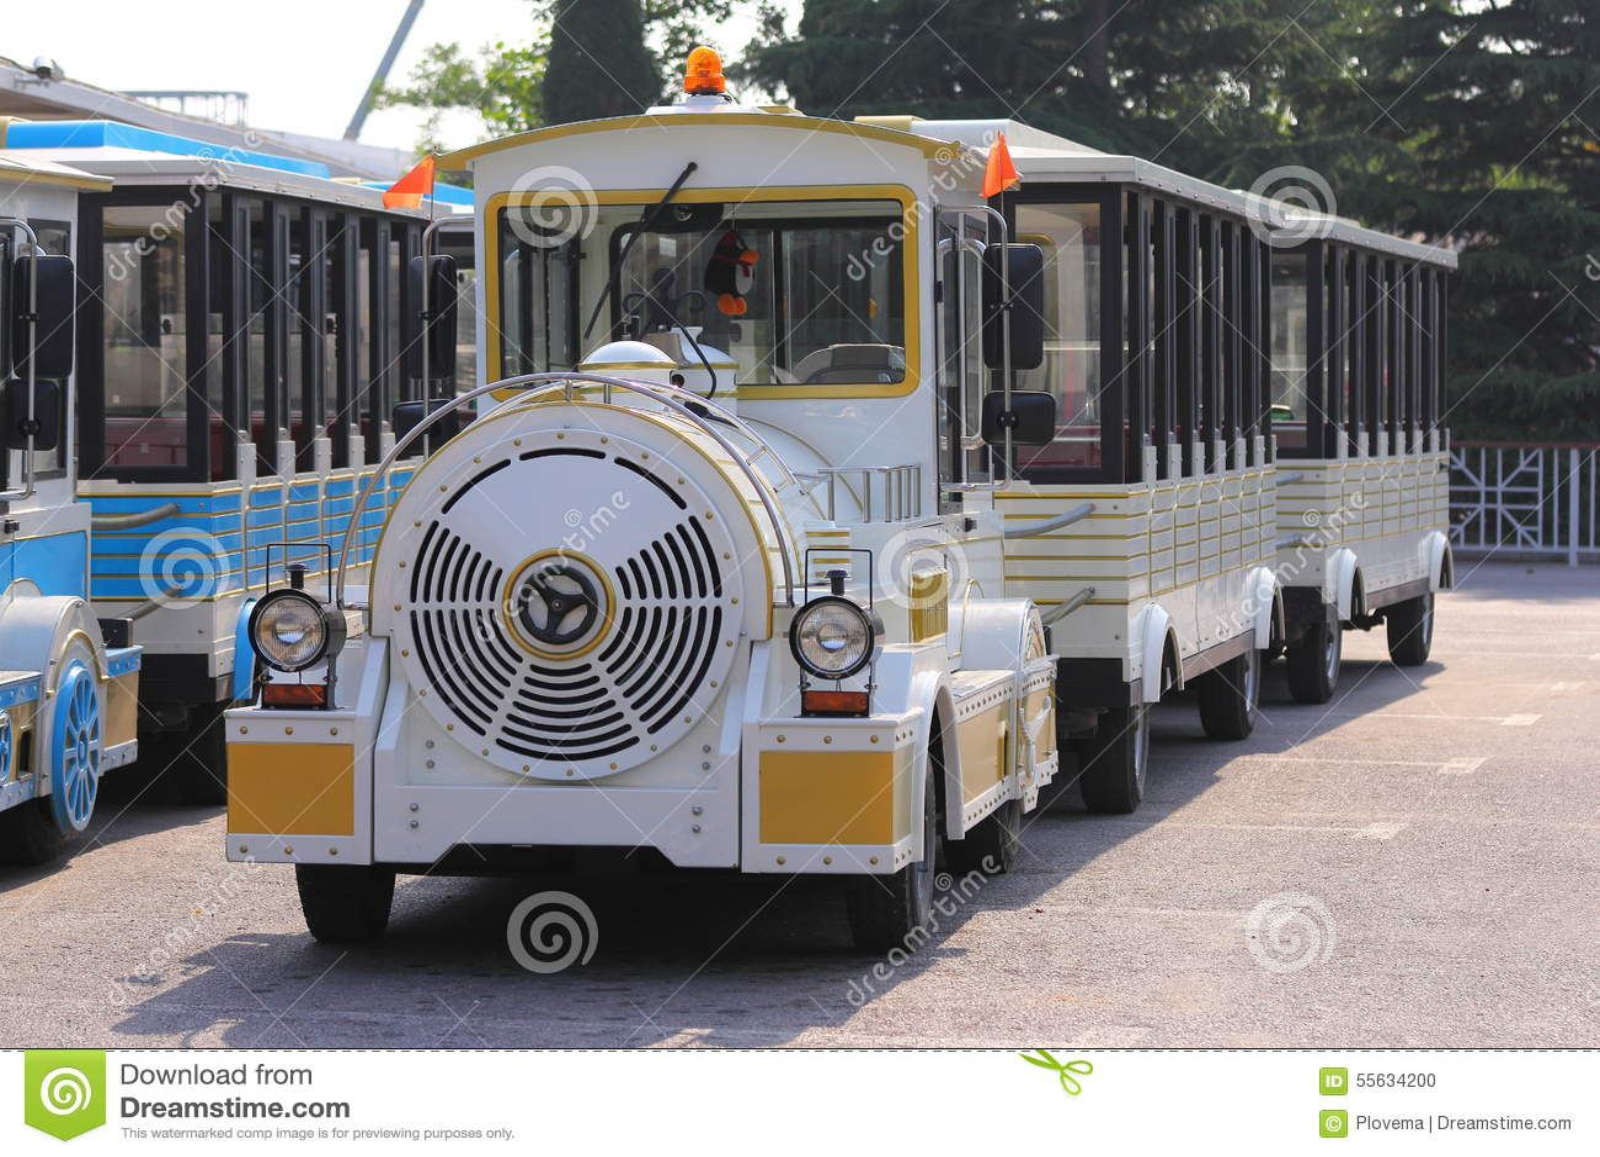 Tour Bus Like A Small Train Stock Photo